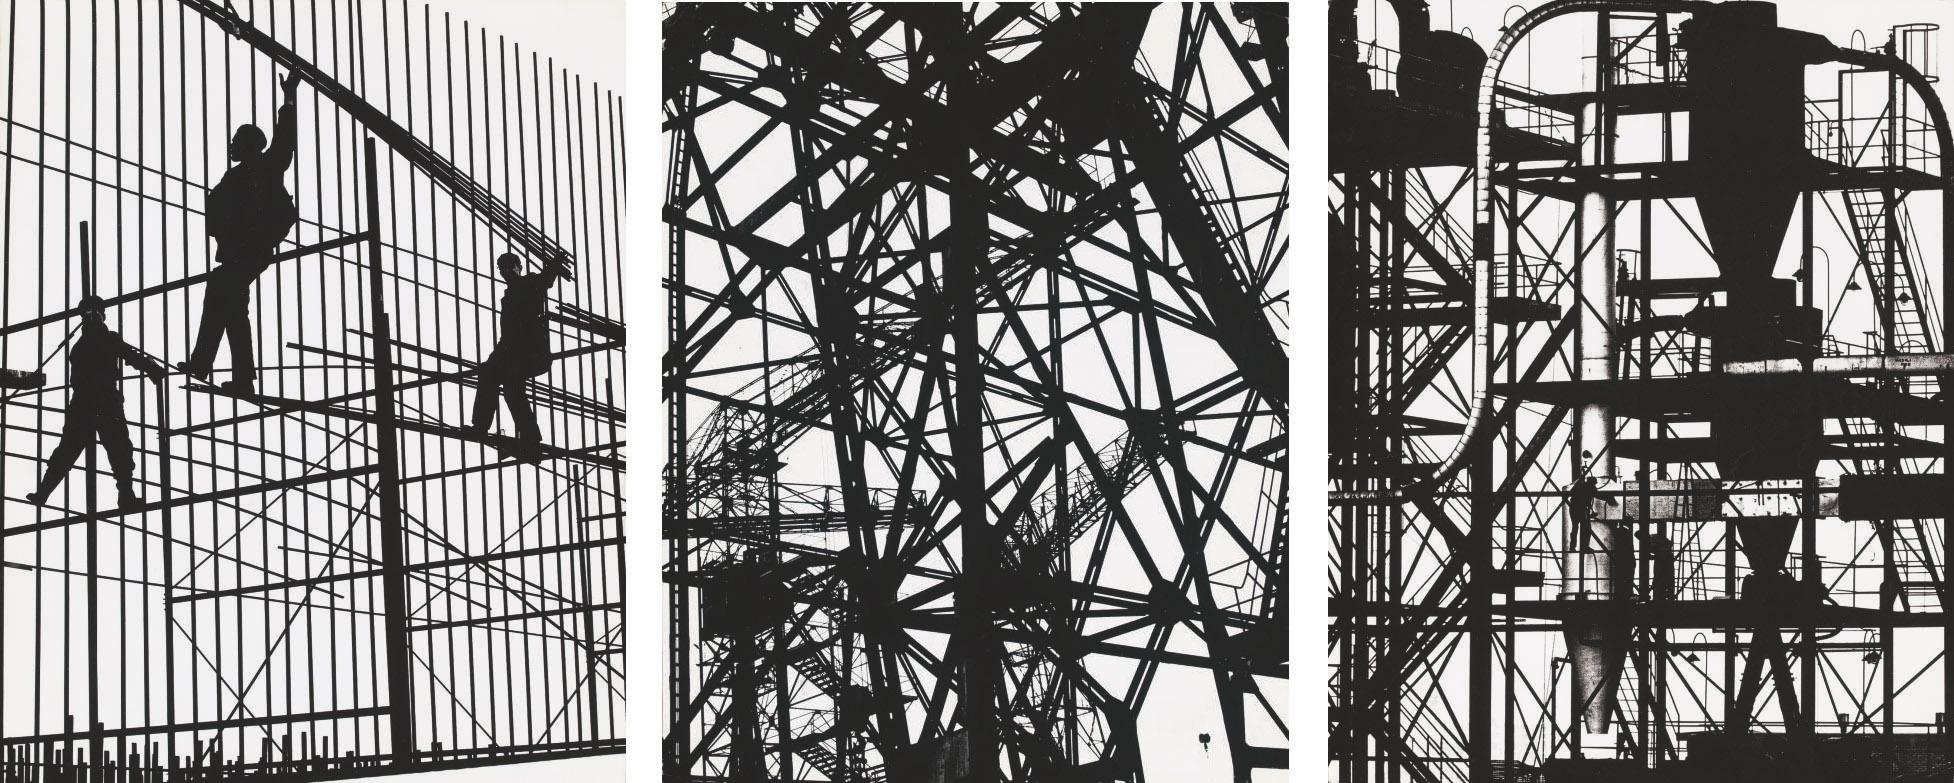 Urban landscapes 1-3, c. 1960